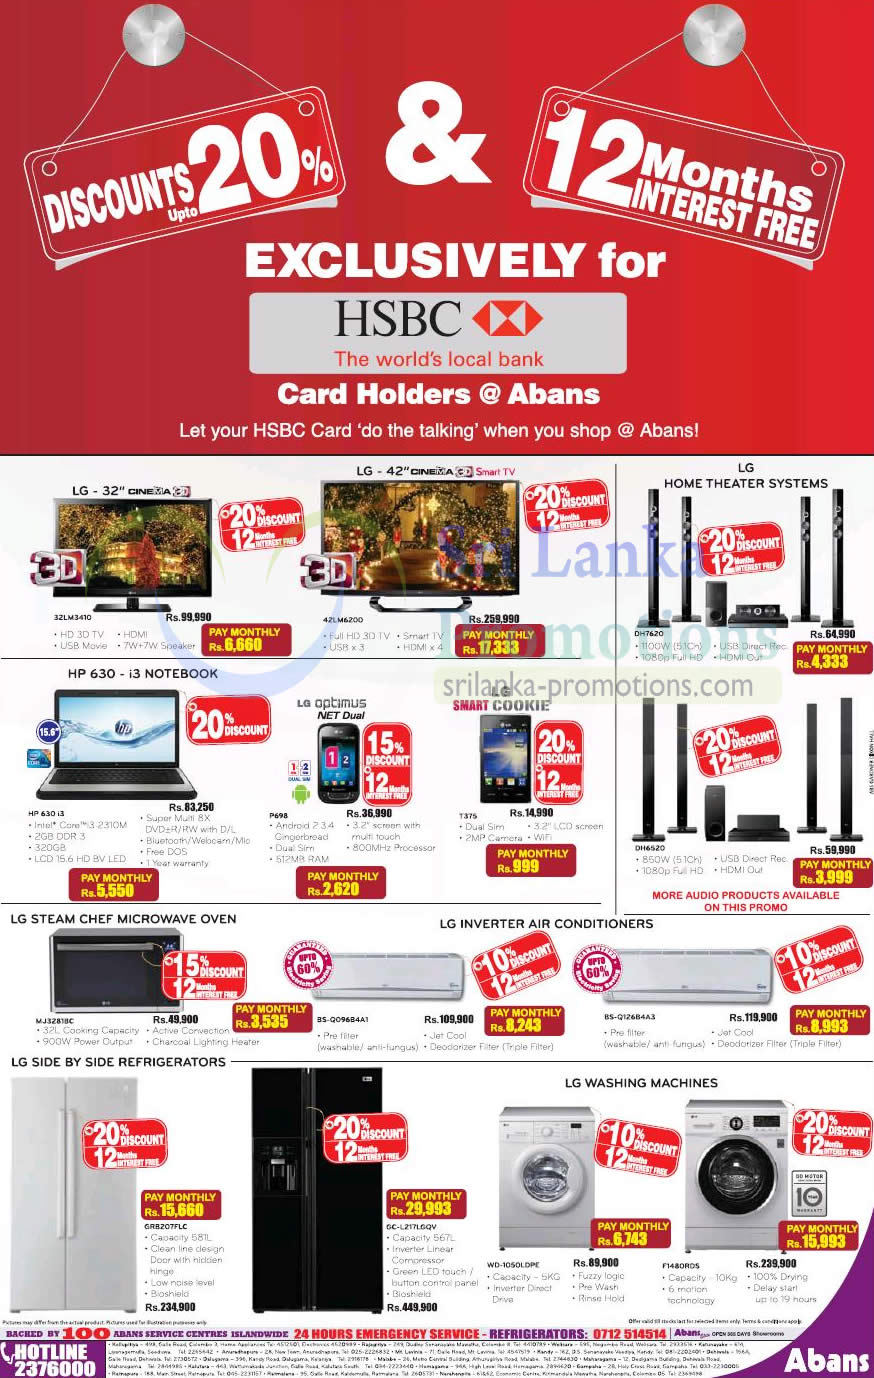 Abans Lg Electronics Amp Appliances Offers Promotion For